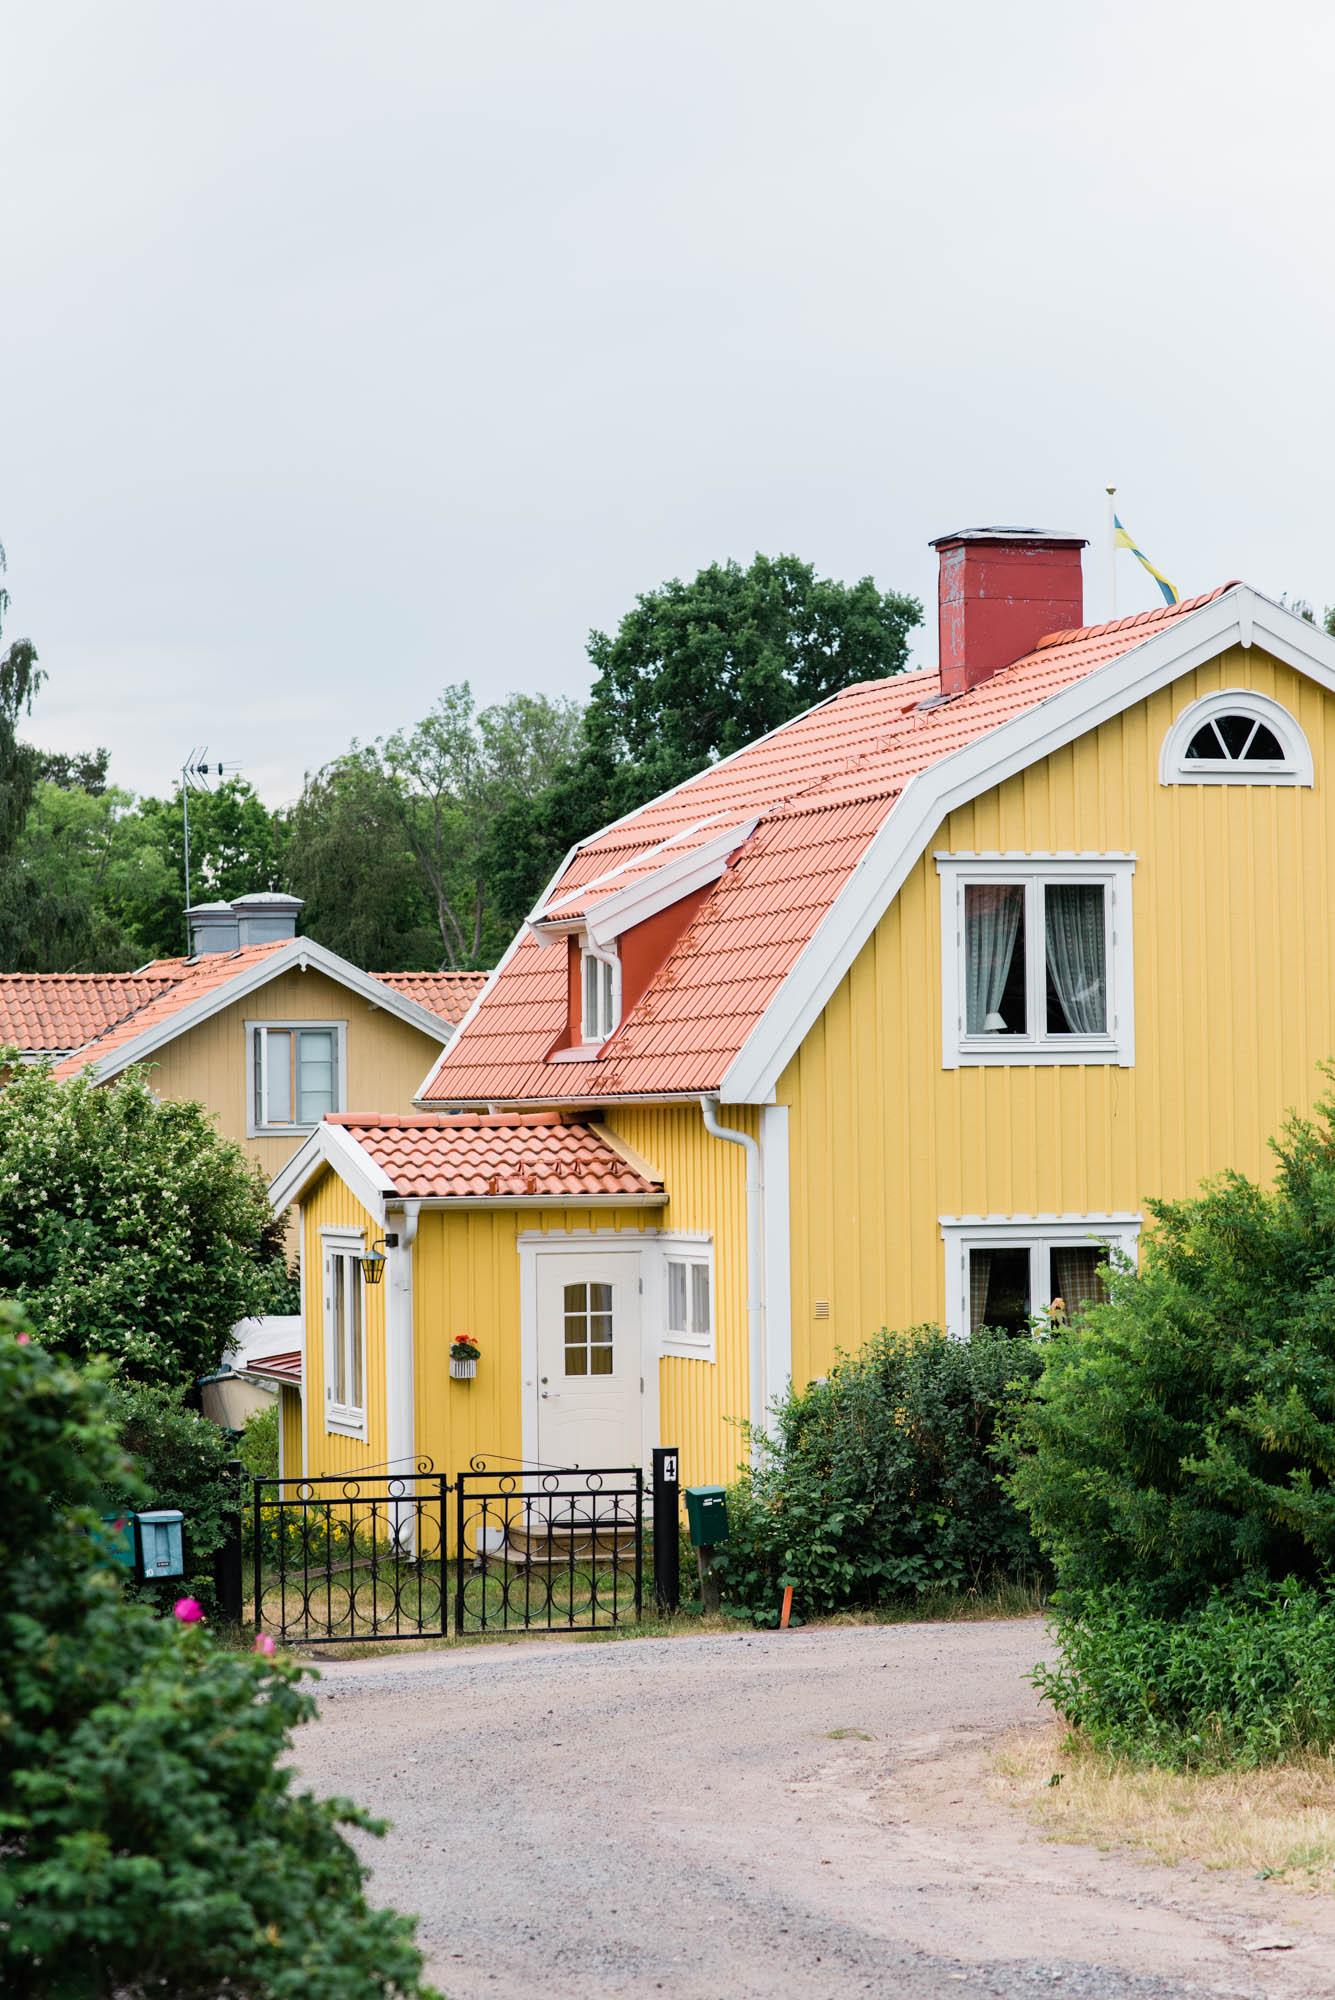 Web-hannah puechmarin-sweden-9072.jpg